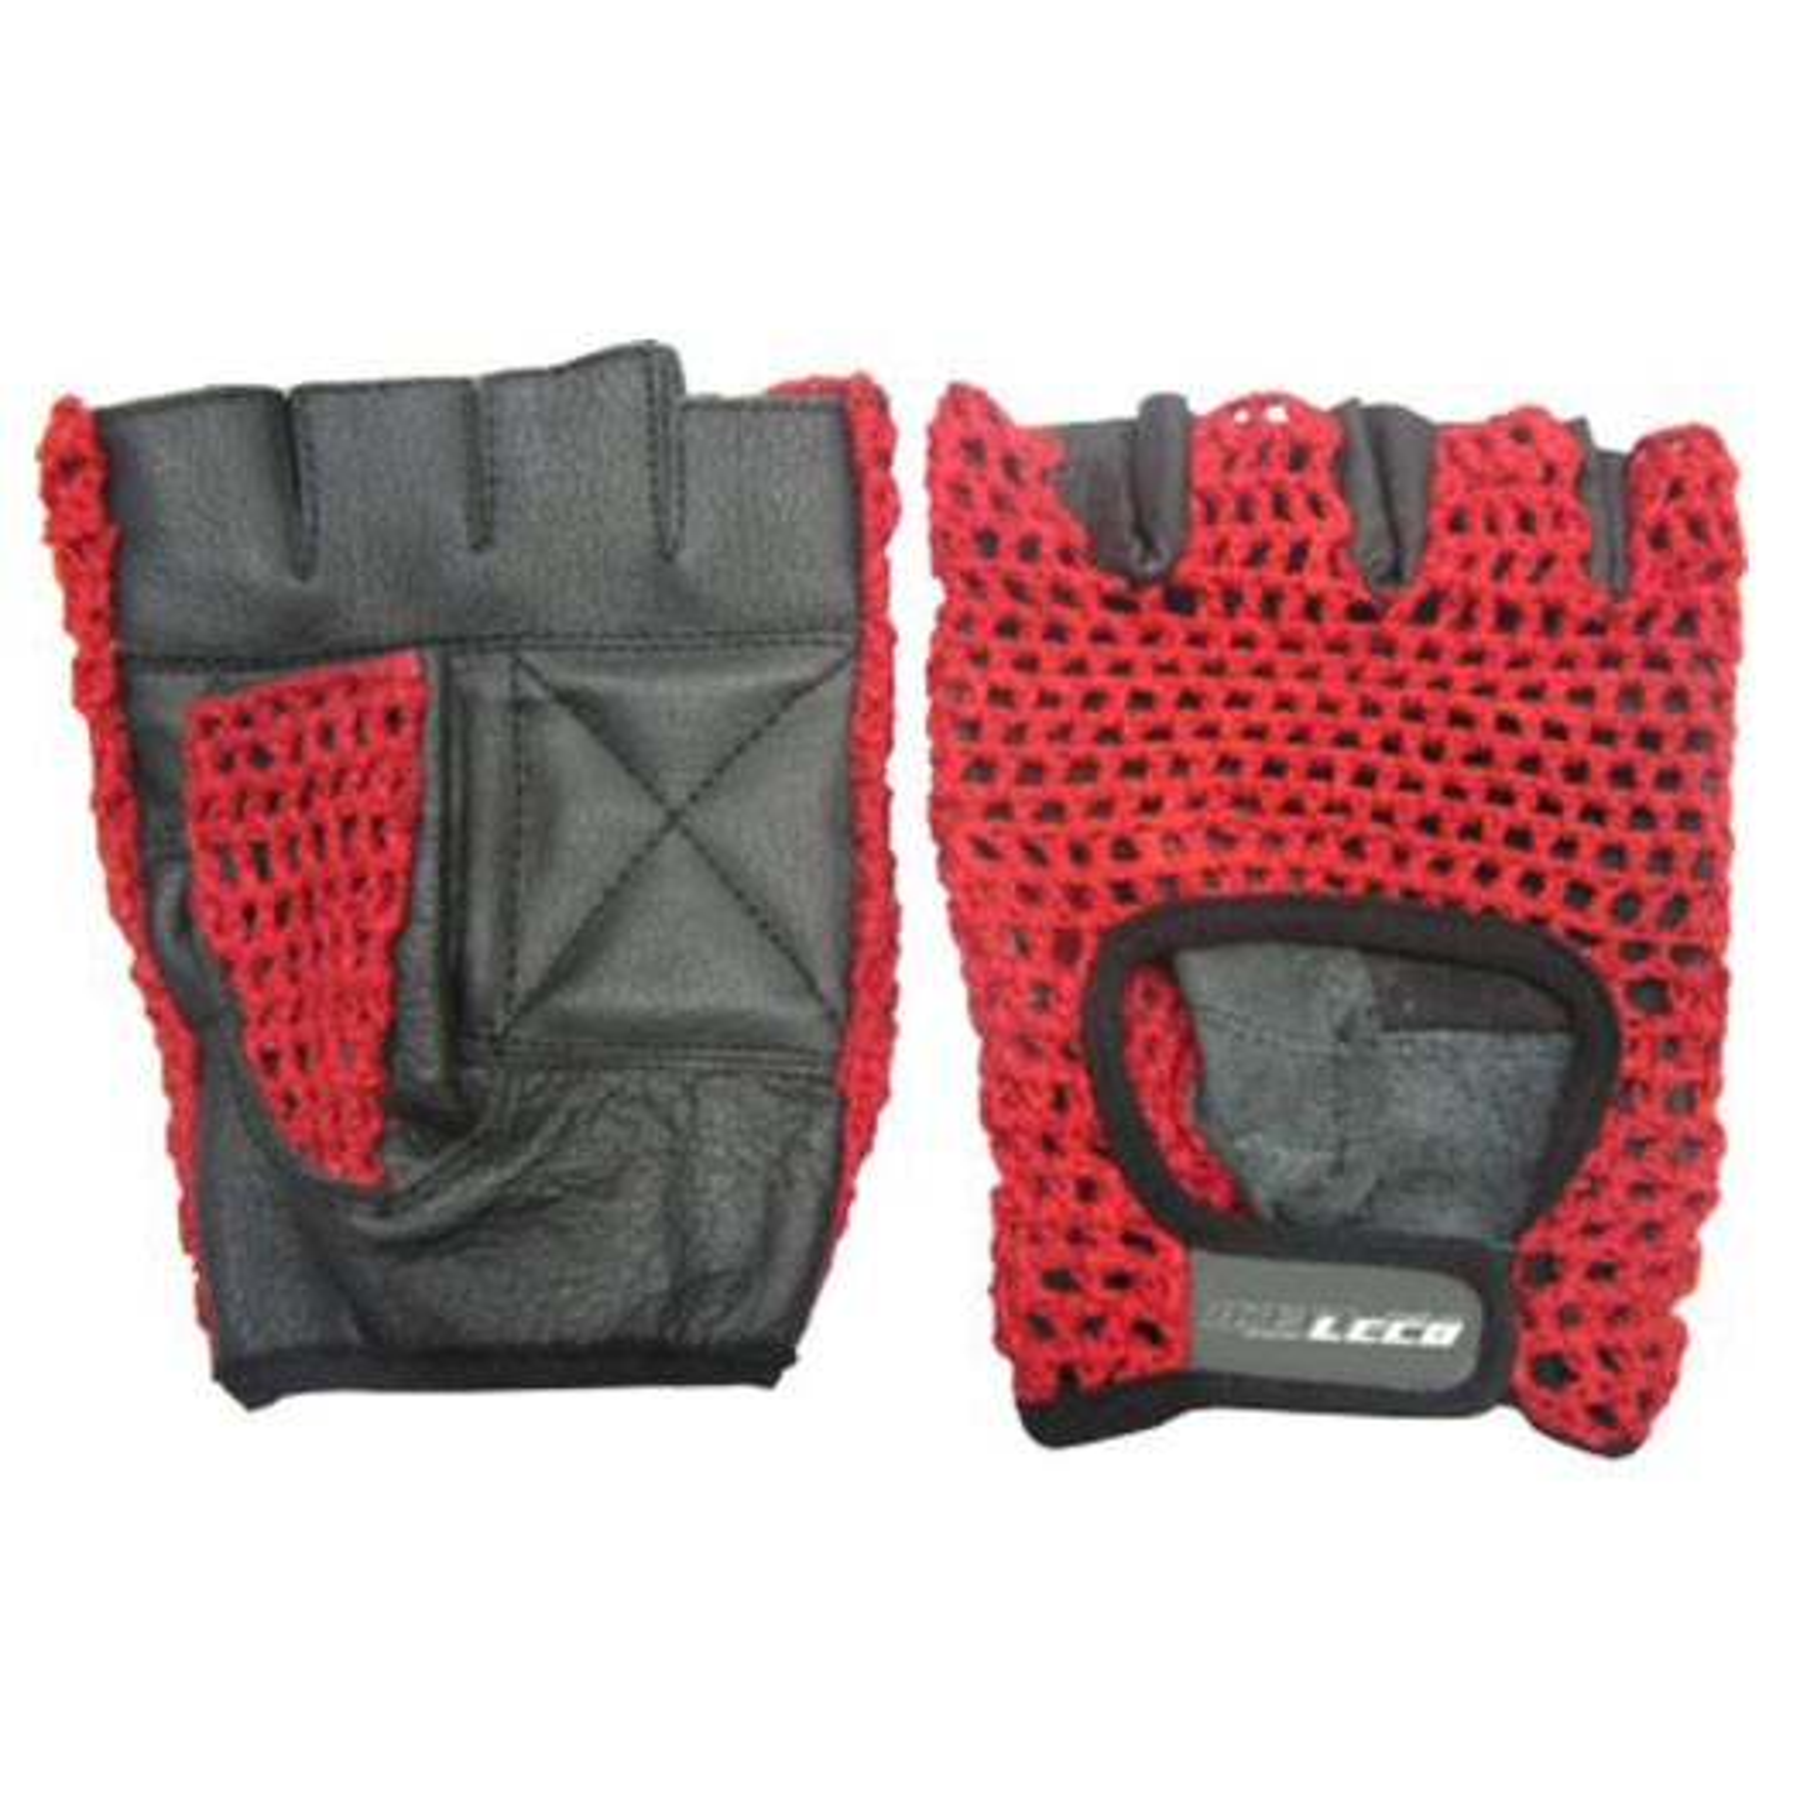 Перчатки для фитнеса ХОУМ кожа/сетка р. M (т11120-2)